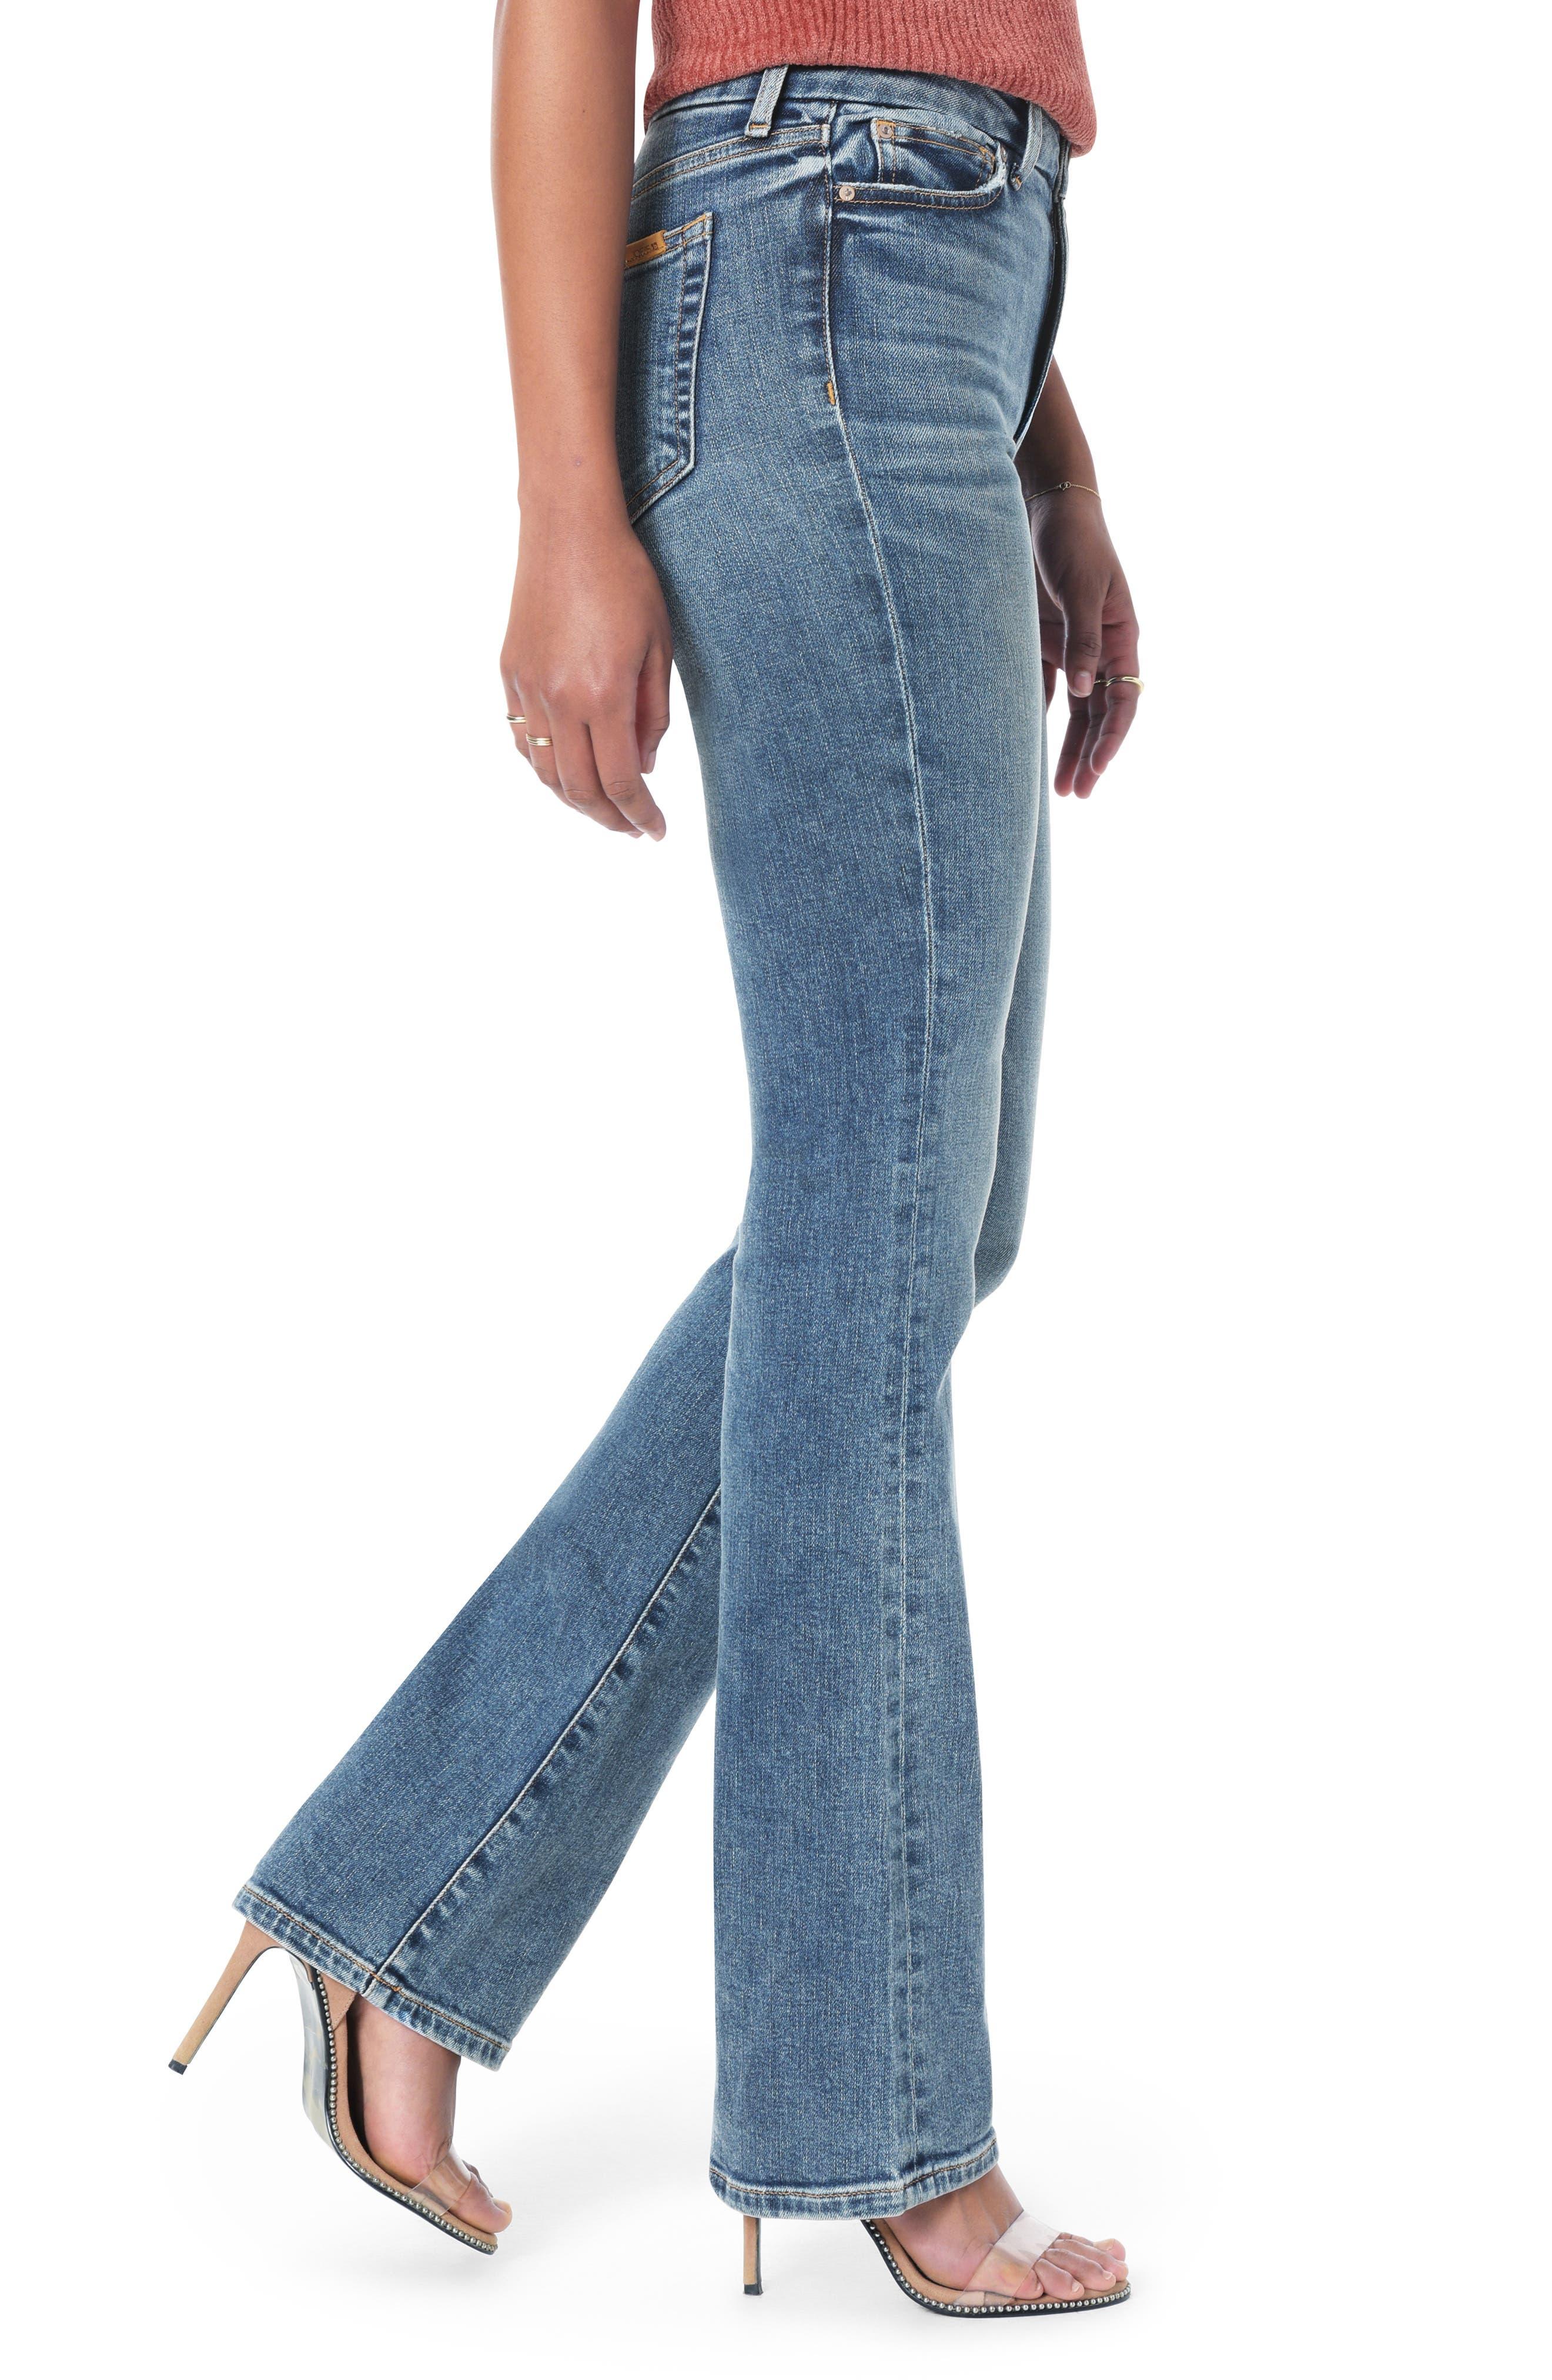 Honey Curvy High Waist Bootcut Jeans,                             Alternate thumbnail 3, color,                             CHRISELLE